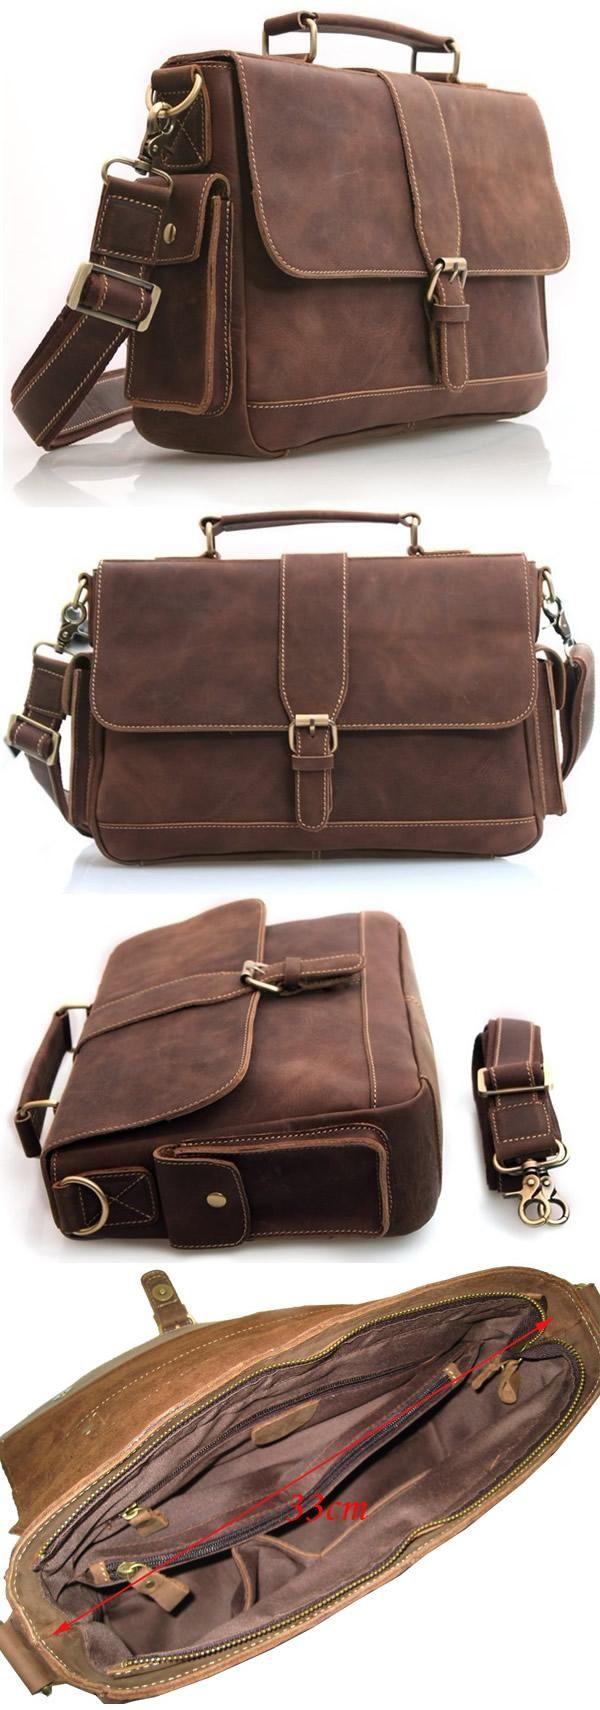 "Vintage Leather Briefcase / Leather Messenger Bag / Leather Satchel / 11"" MacBook Air or 12"" Laptop Bag"